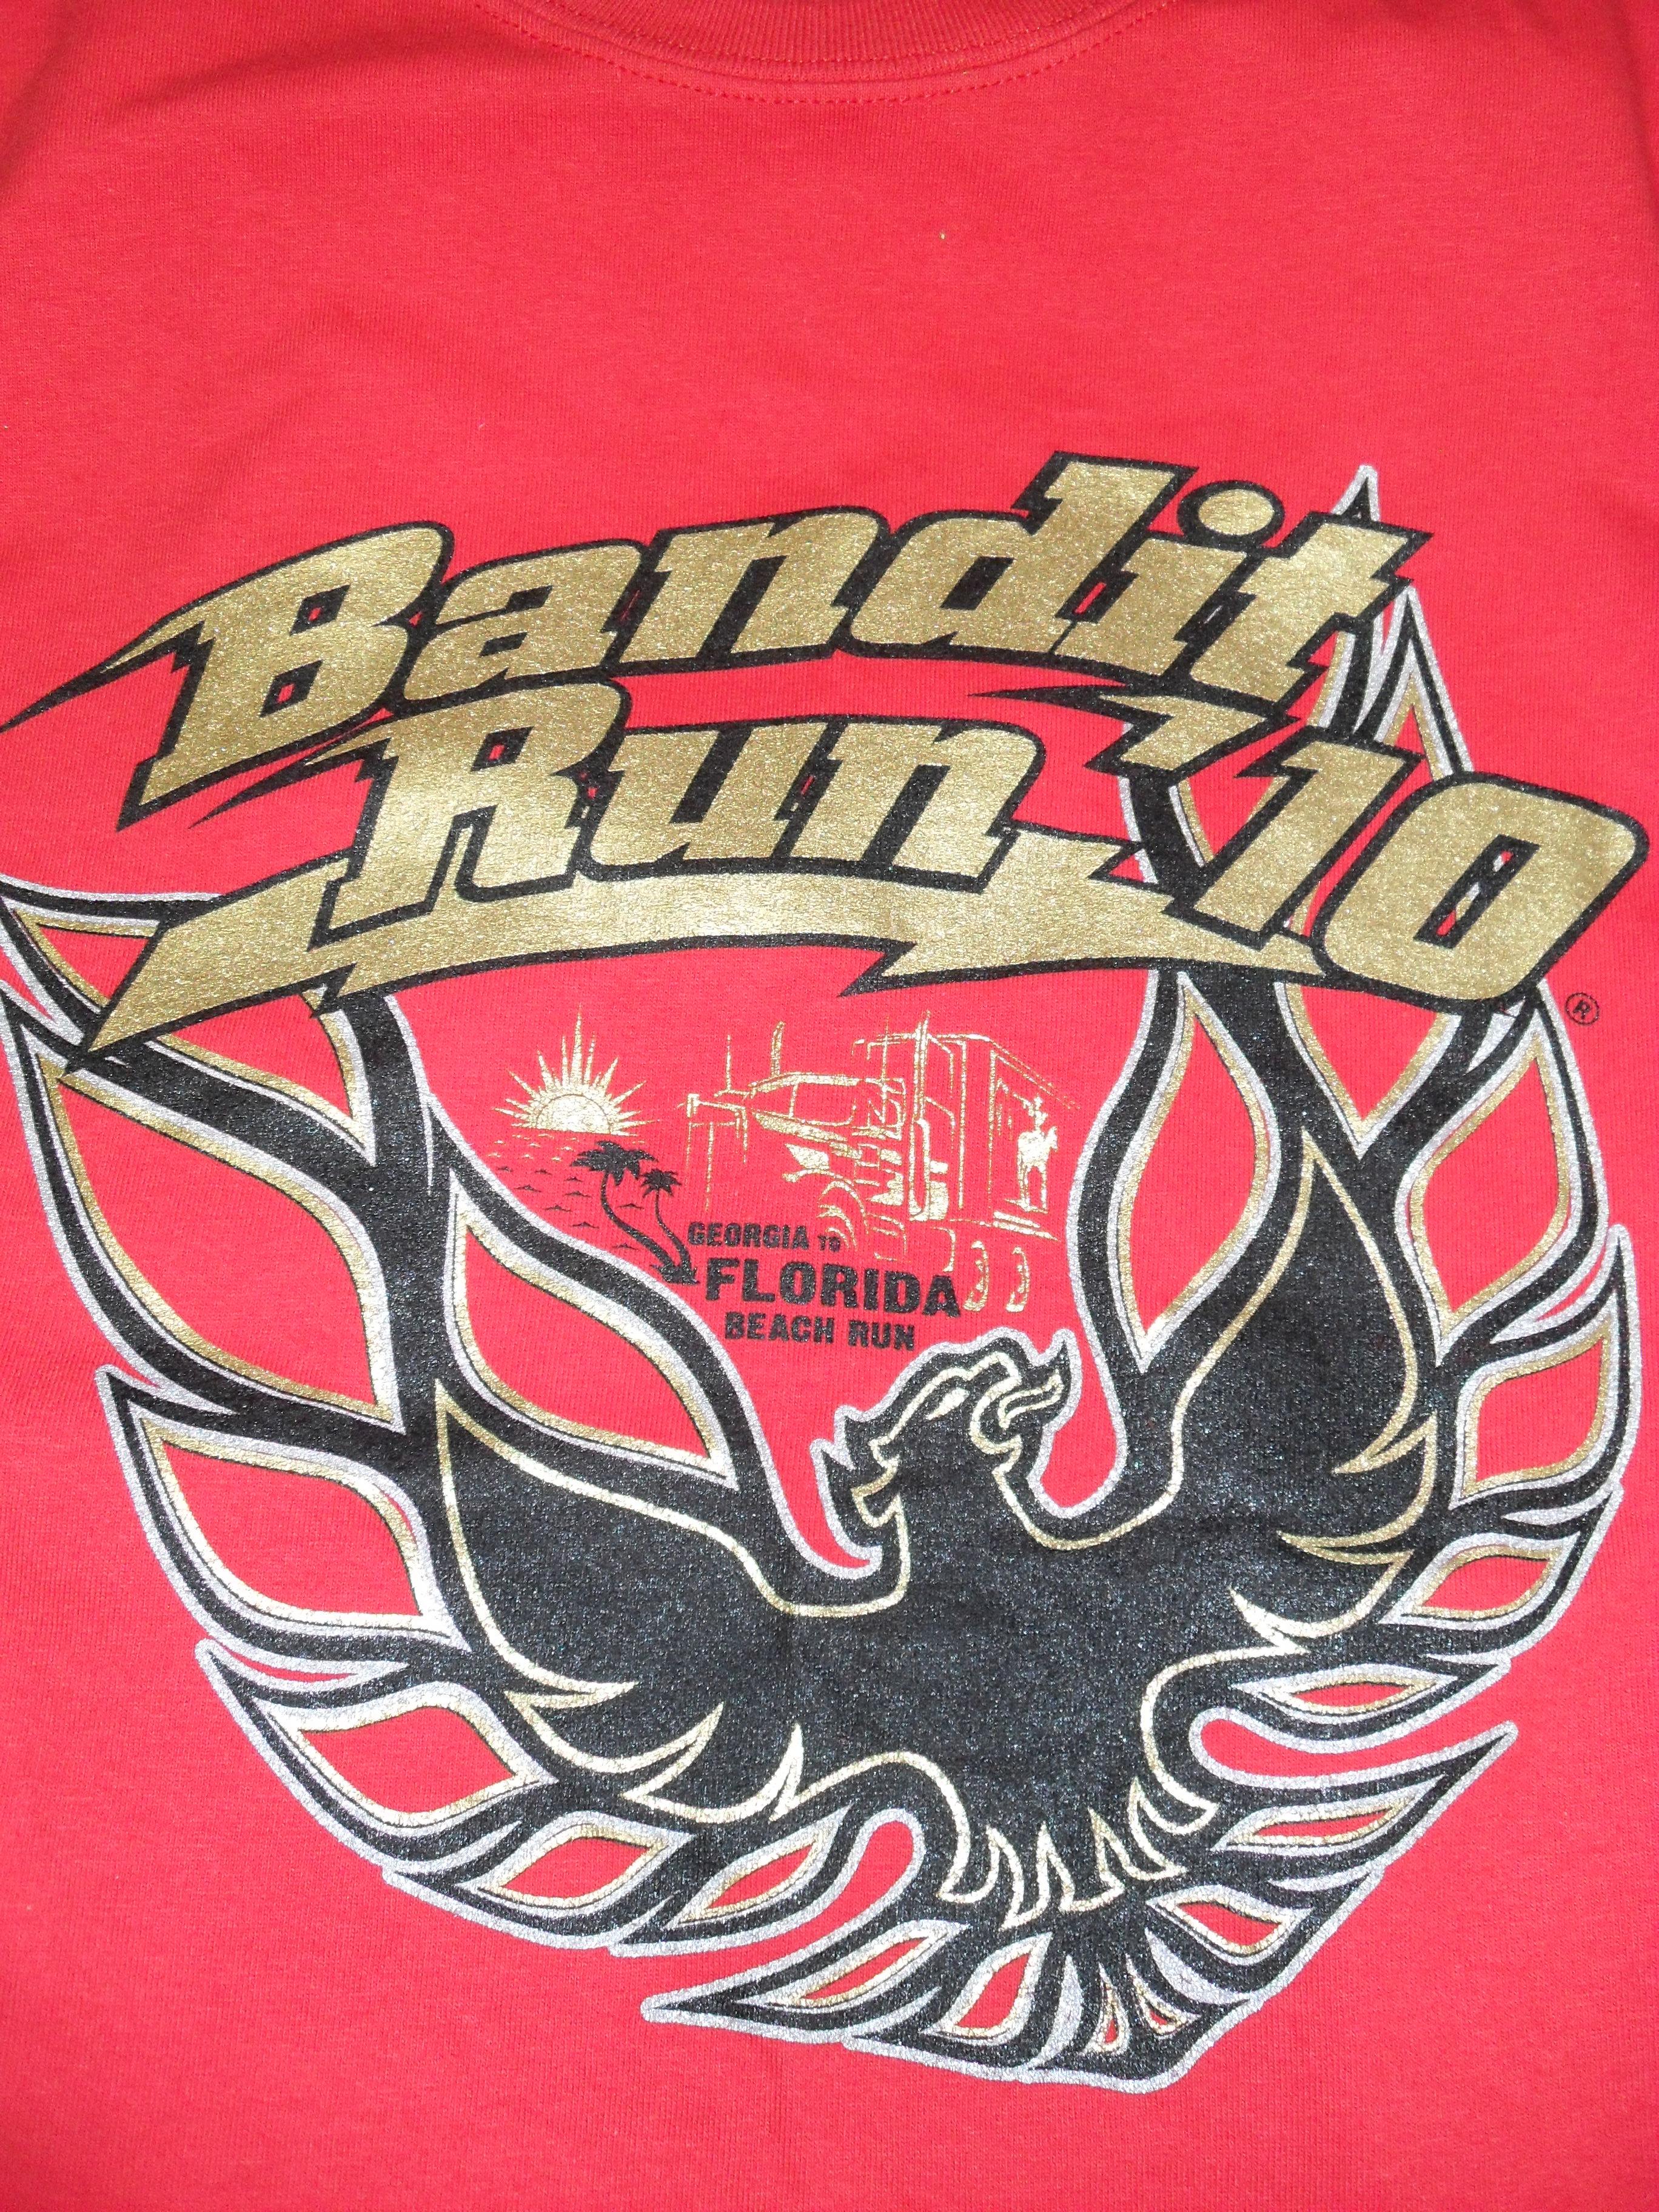 The Bandit Run